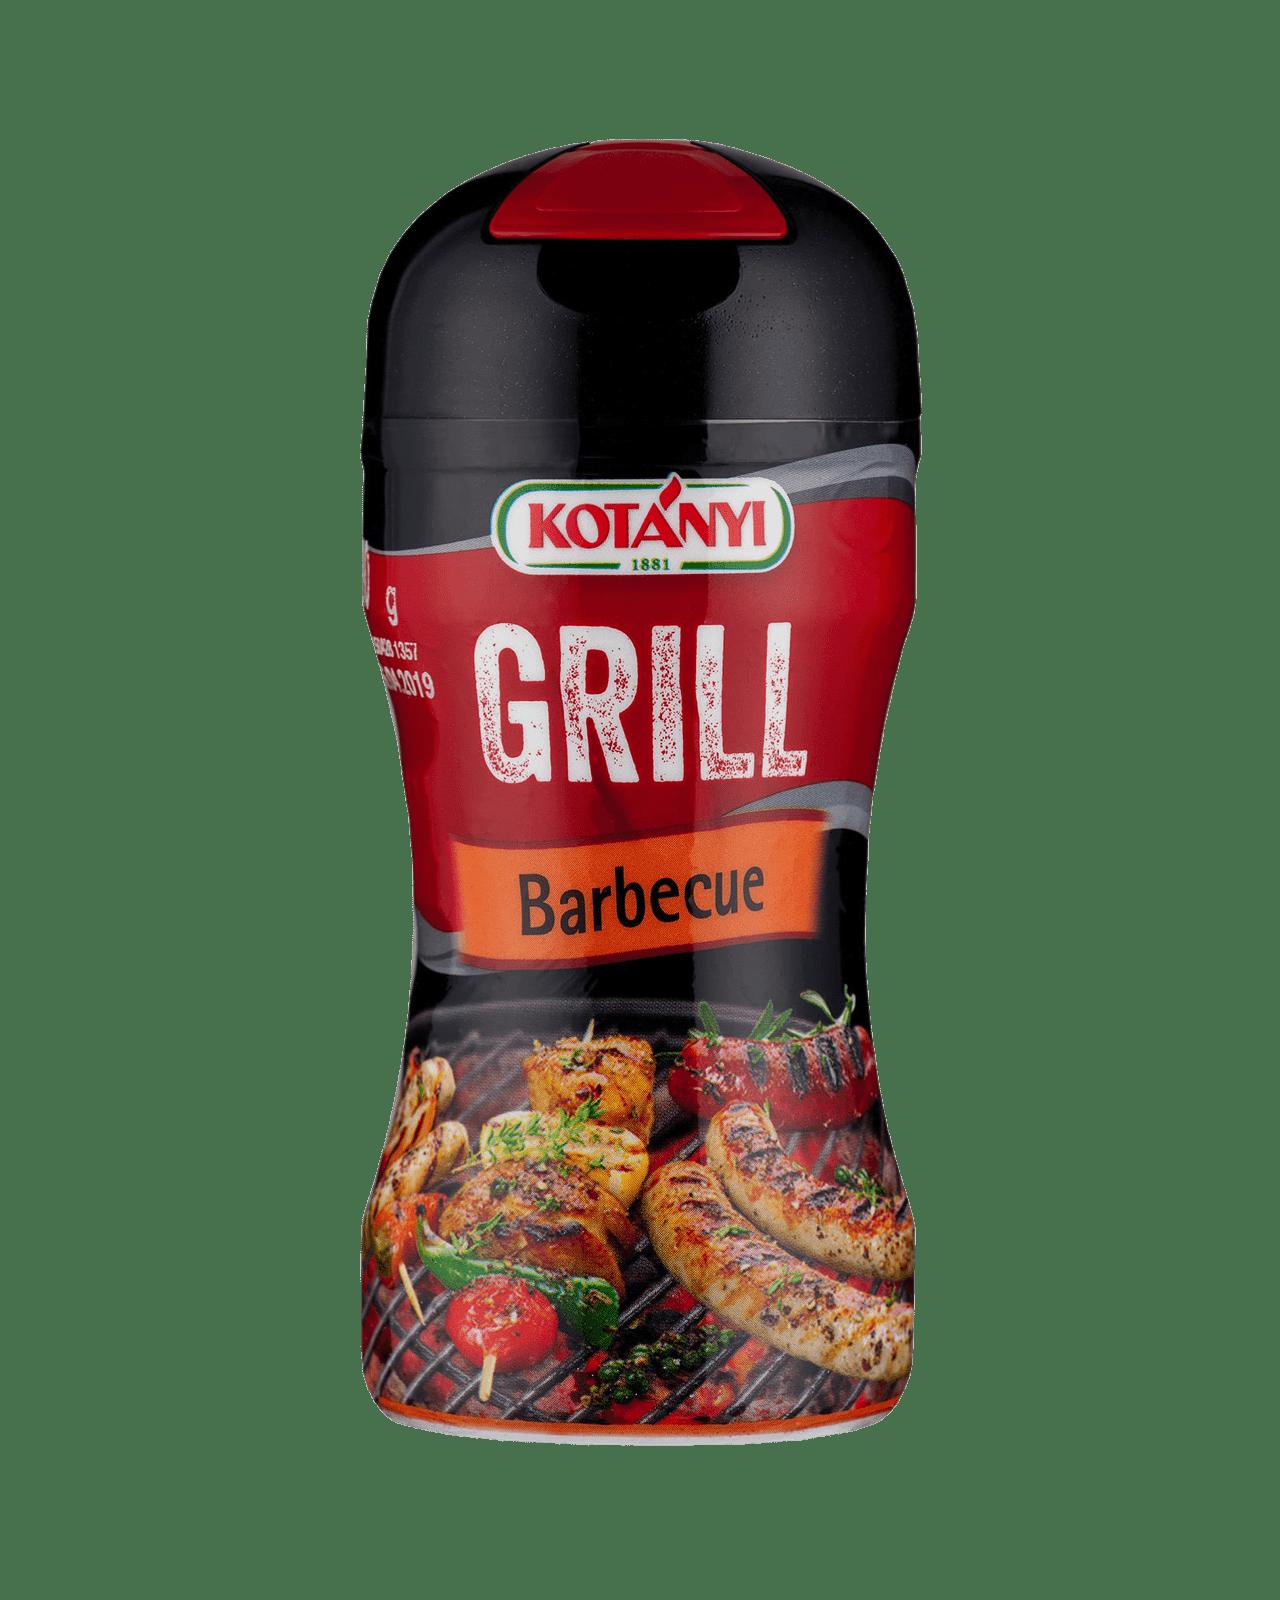 Kotányi Grill Barbecue Grillgewuerz in der Streudose